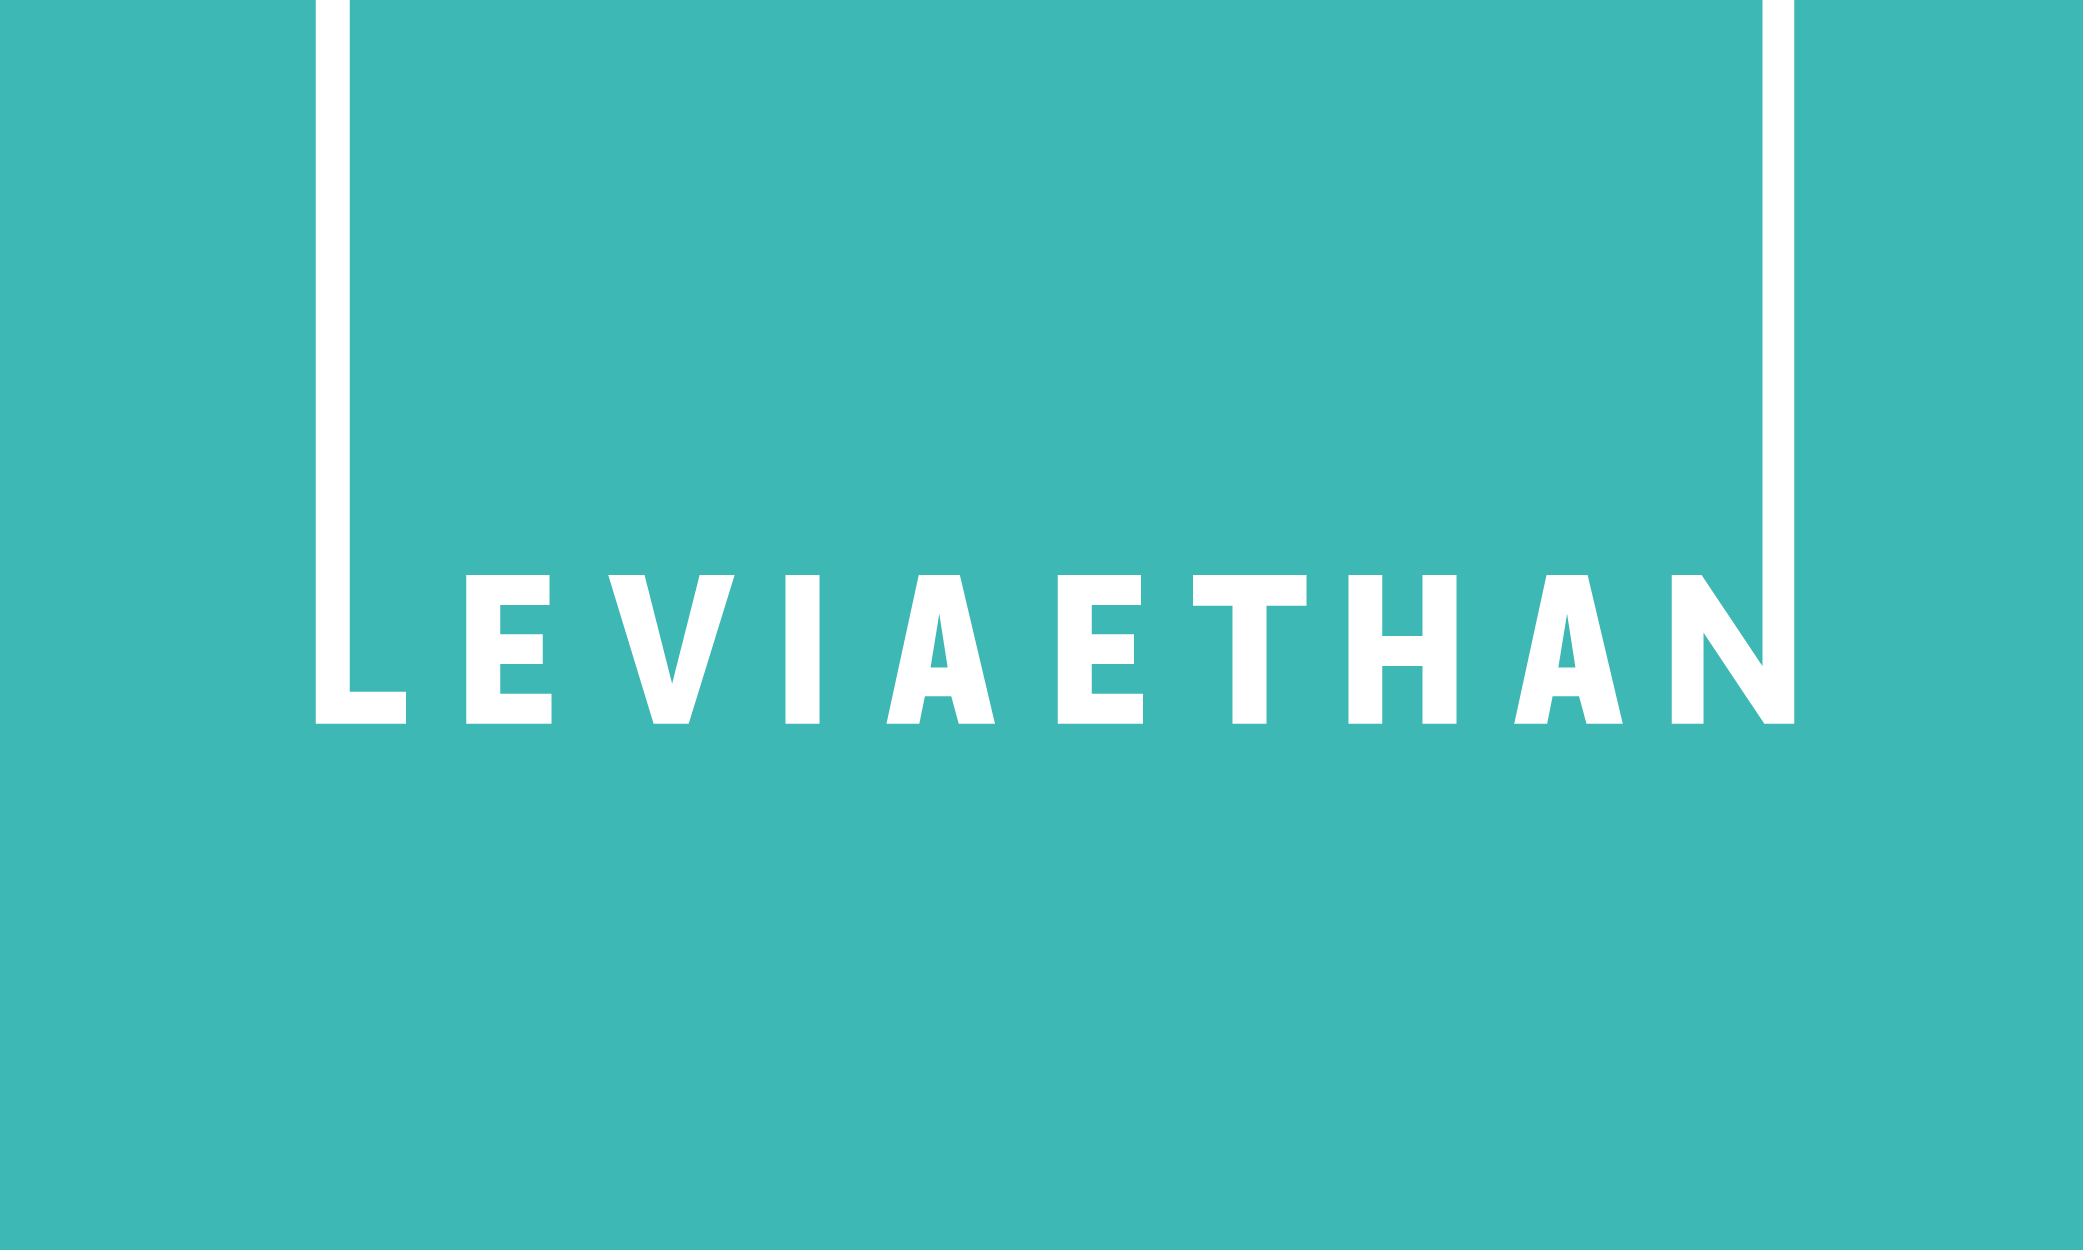 leviaethan-typeface-01